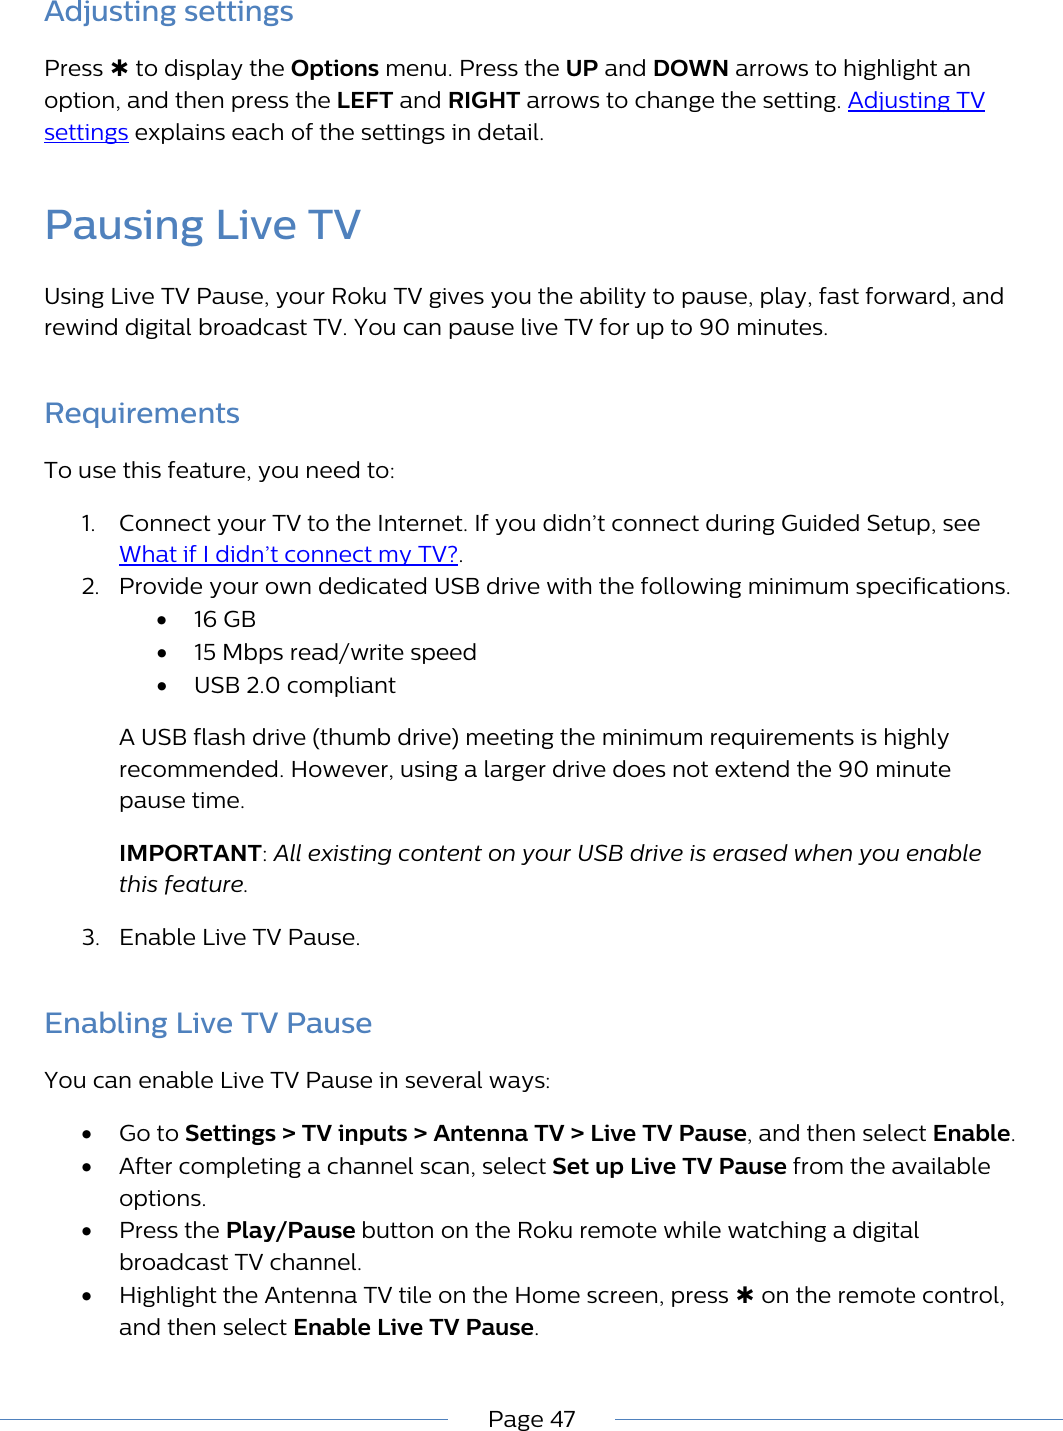 Philips 40PFL4662/F7 Roku TV User Guide Manual 40pfl4662 F7 Dfu Aen